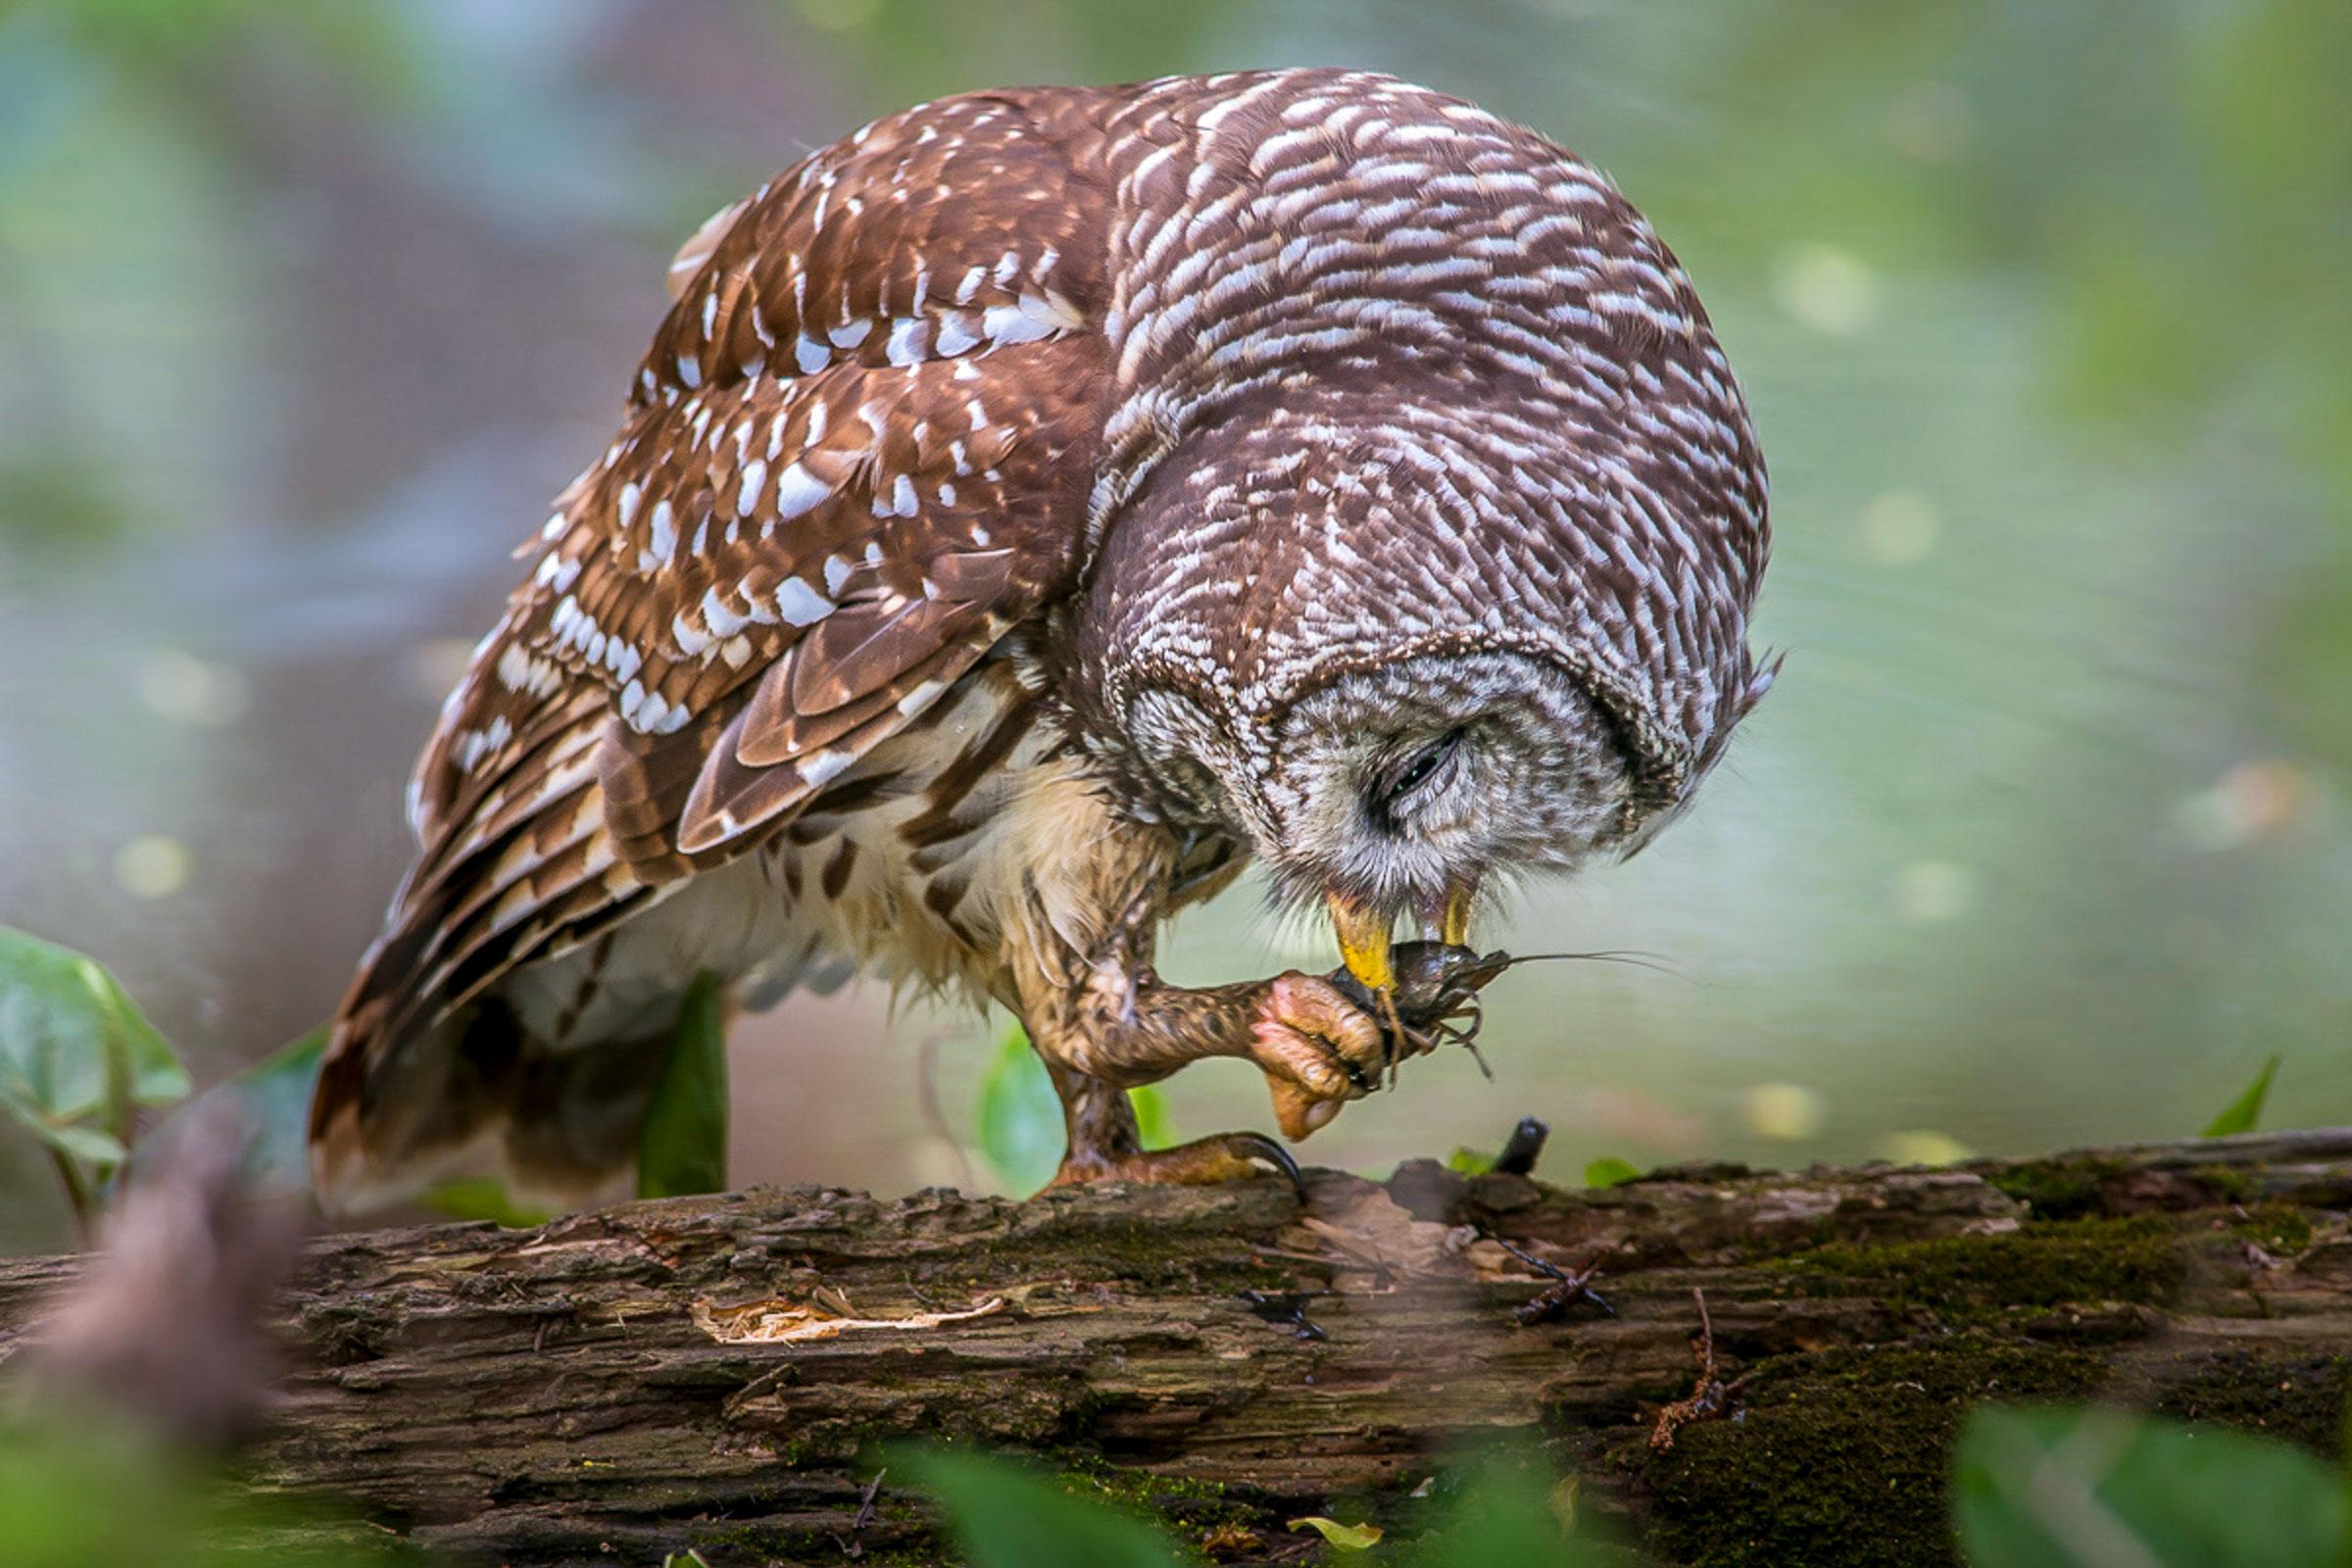 Barred Owl eating a crayfish. Chokchai Leangsuksun/Audubon Photography Awards